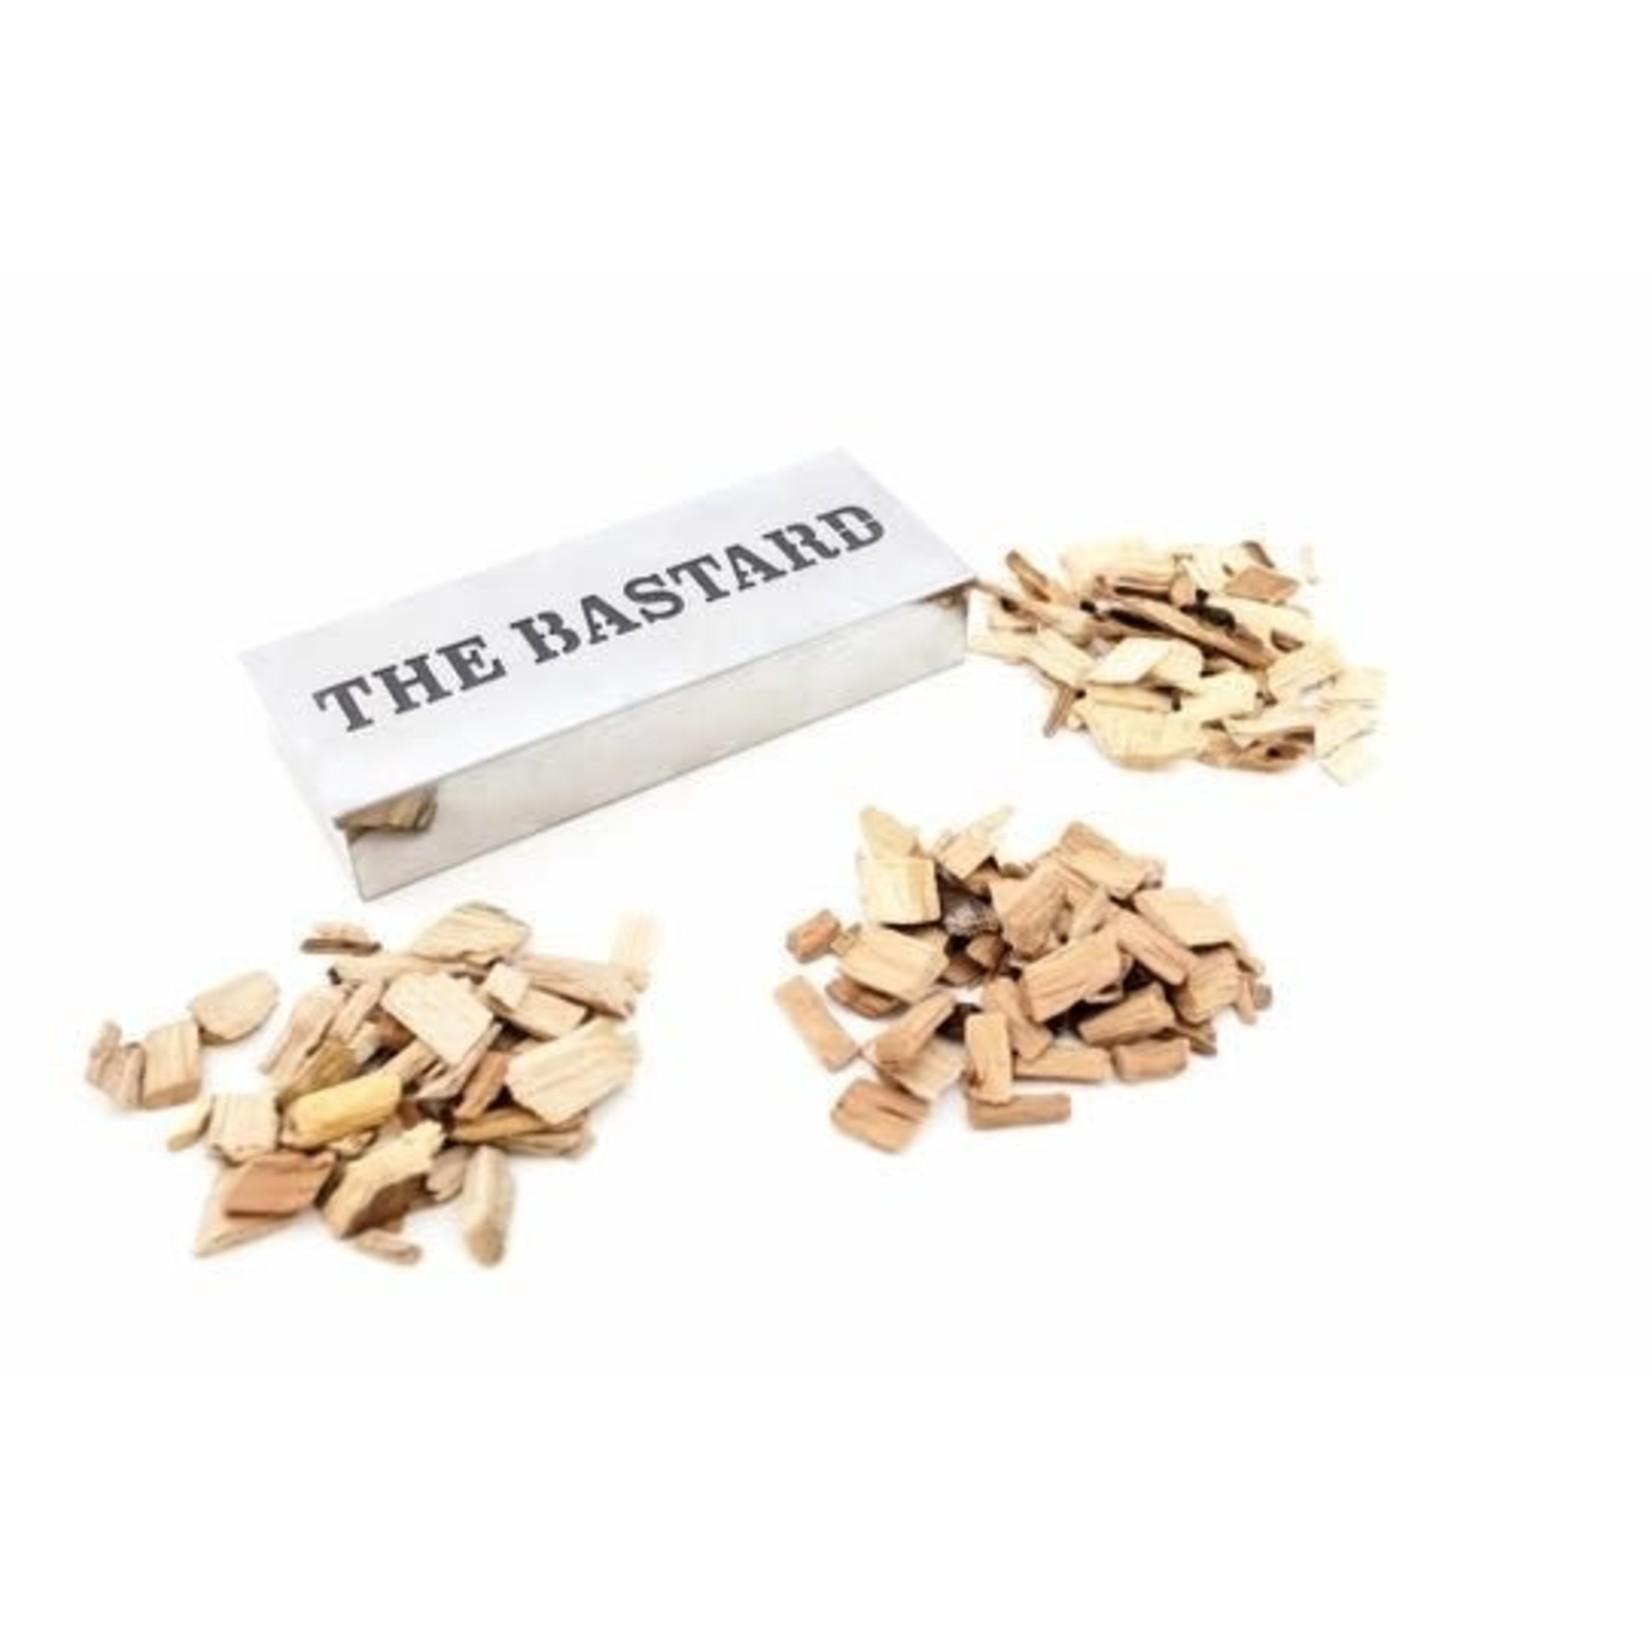 The Bastard The Bastard Smoker kit